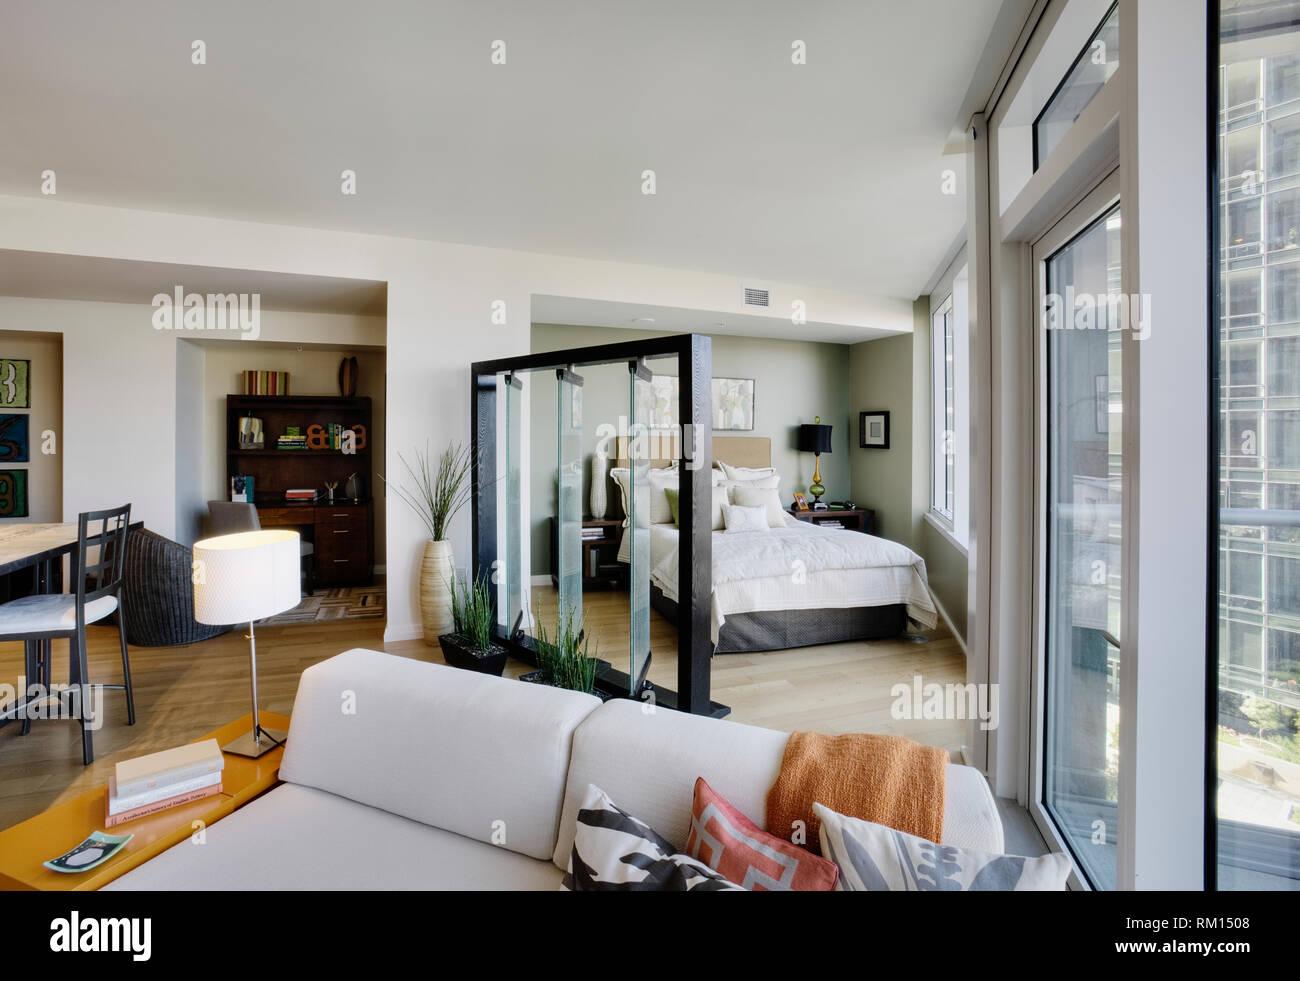 Open Floor Plan In Luxury Highrise Apartment Stock Photo Alamy